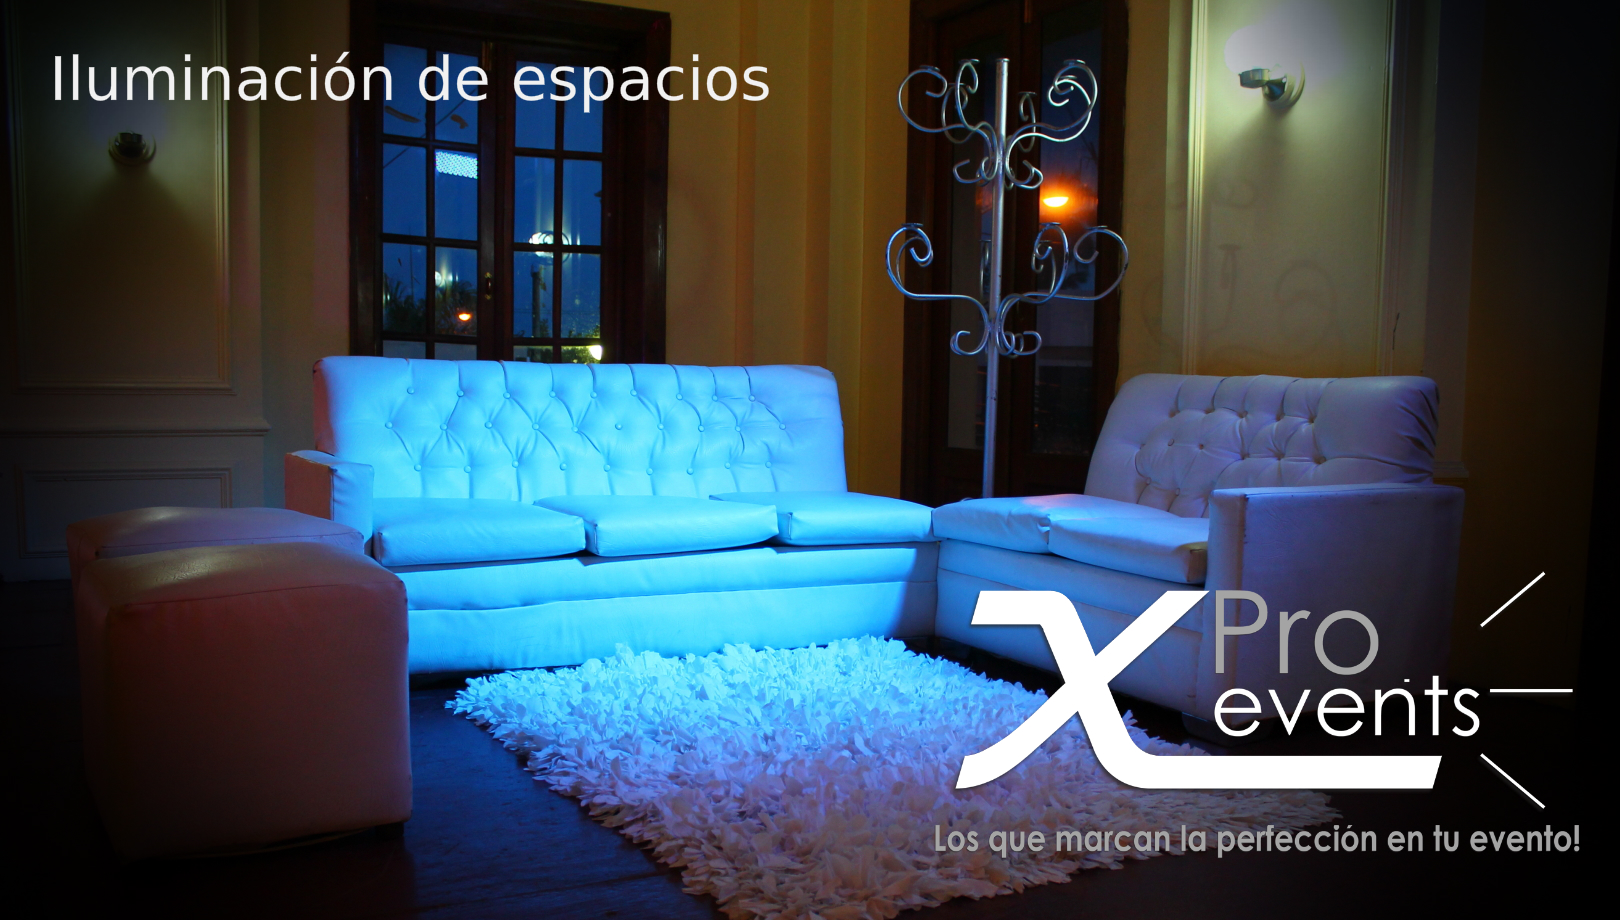 X Pro events_2014_06_22_0149.JPG